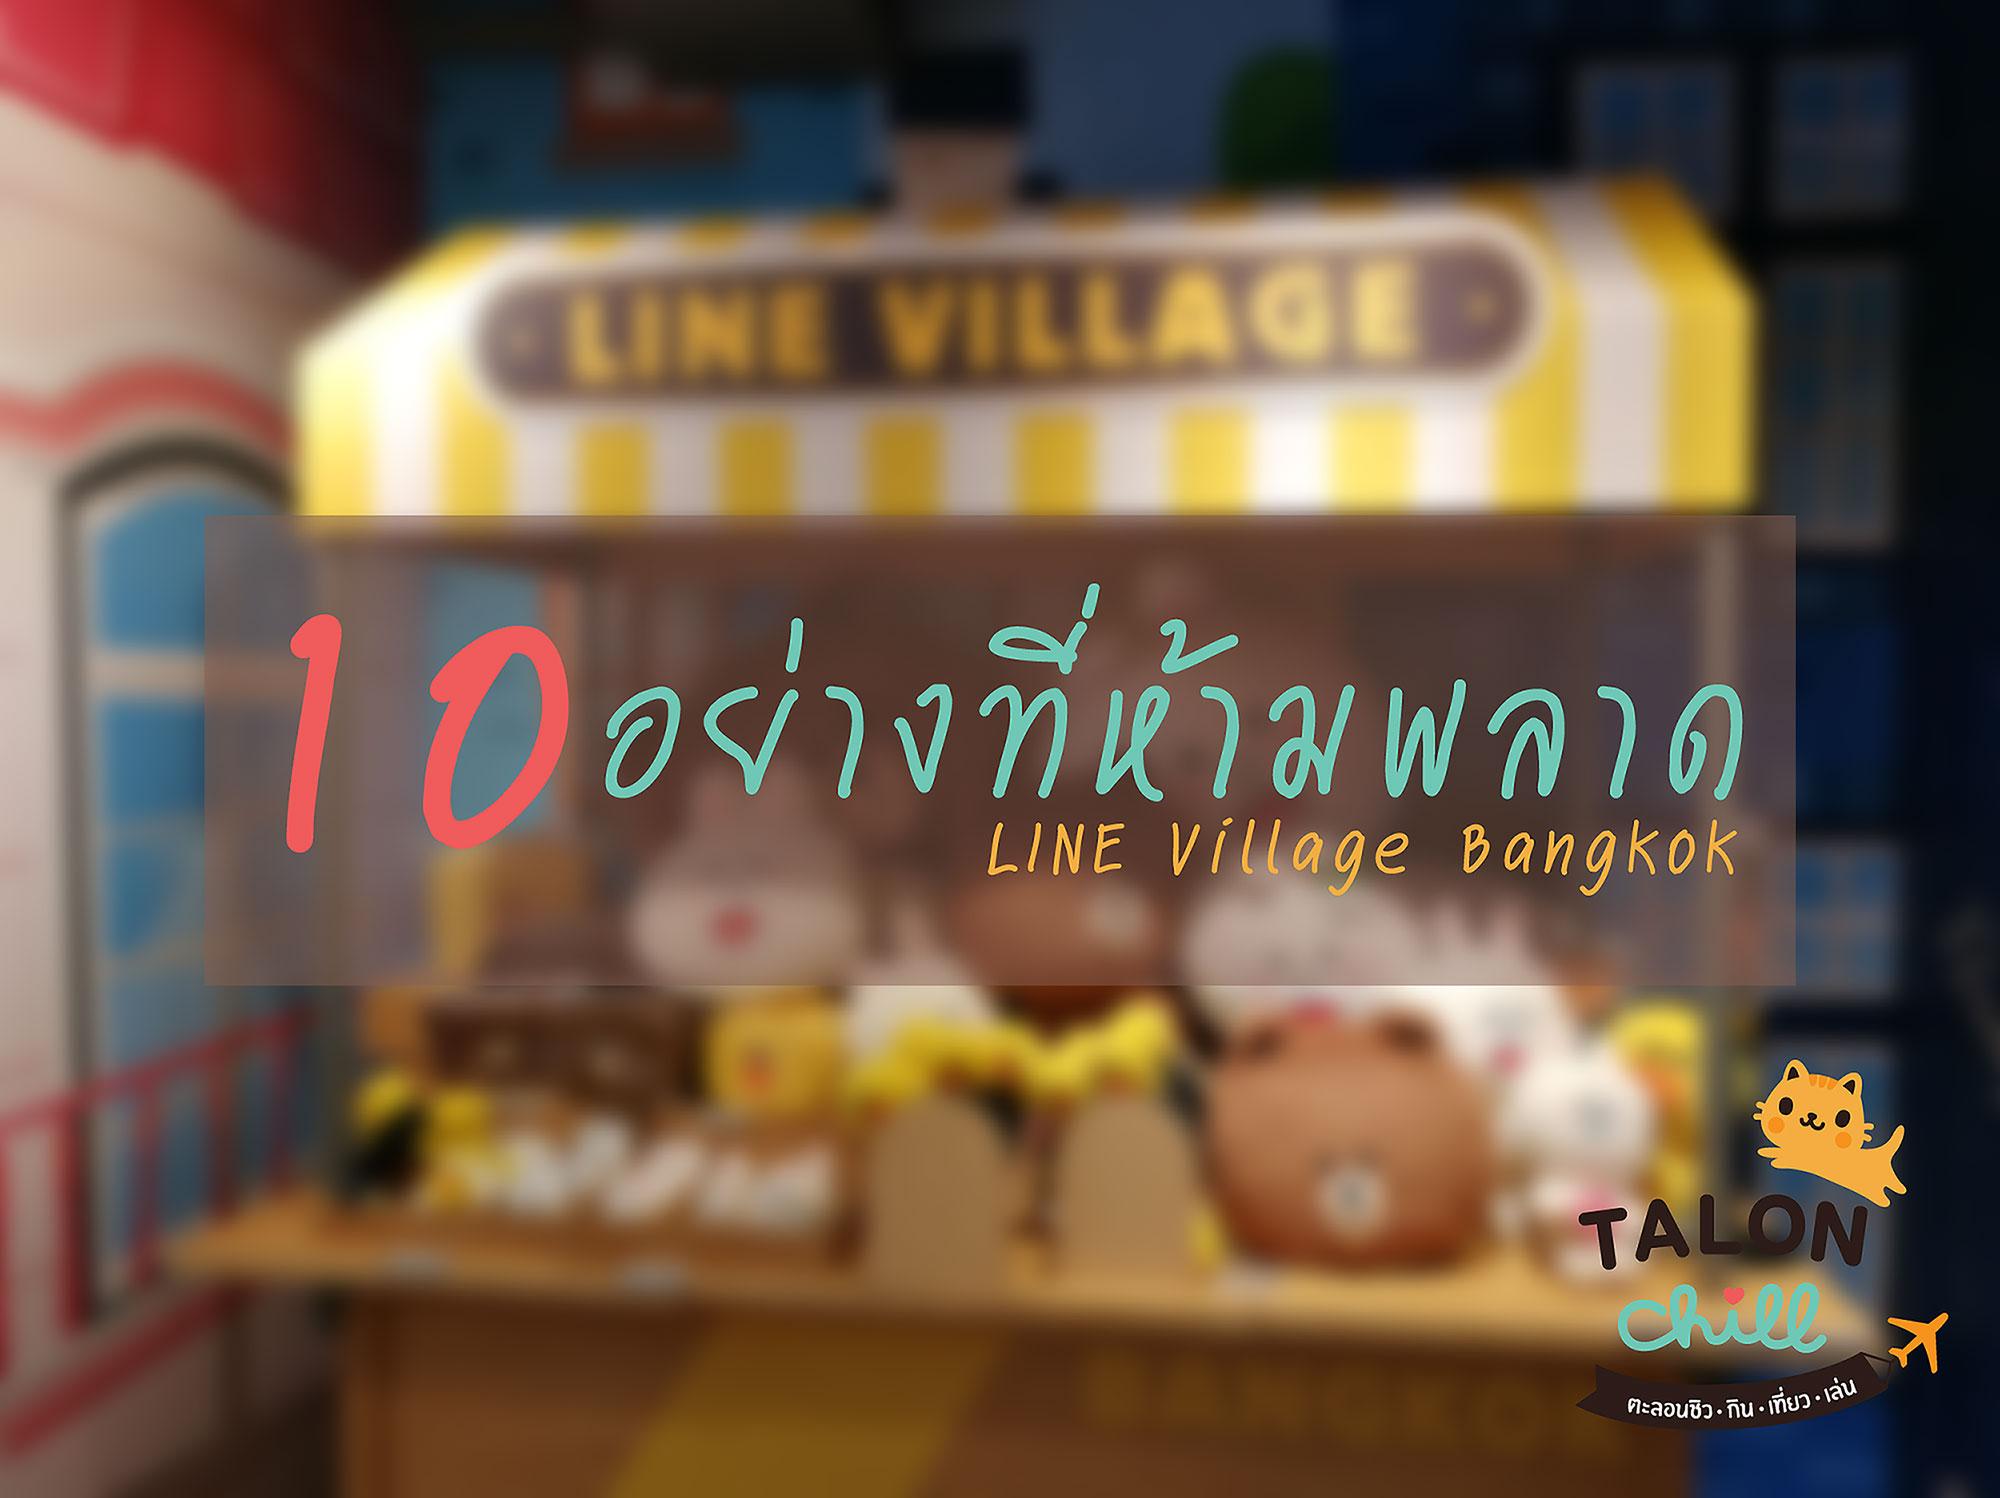 [Review] สินค้า 10 อย่างที่ห้ามพลาดมาร้าน LINE VILLAGE BANGKOK